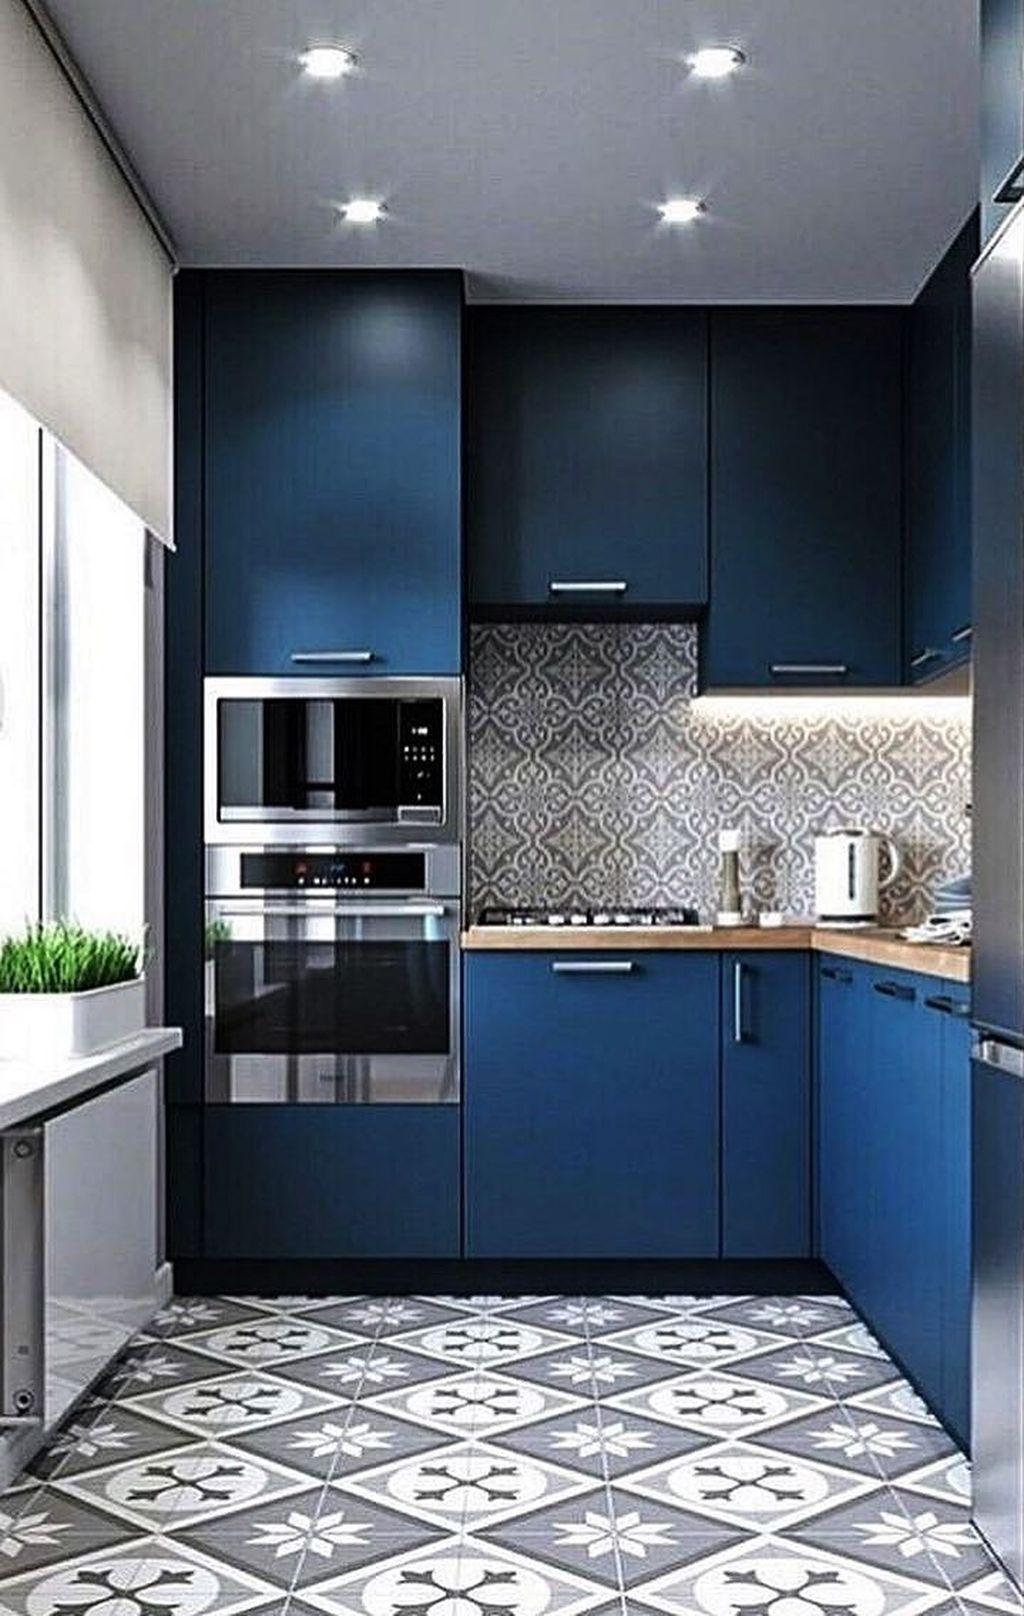 32 The Best Small Kitchen Design Ideas Homyhomee Kitchen Remodel Small Modern Kitchen Design Small Kitchen Decor